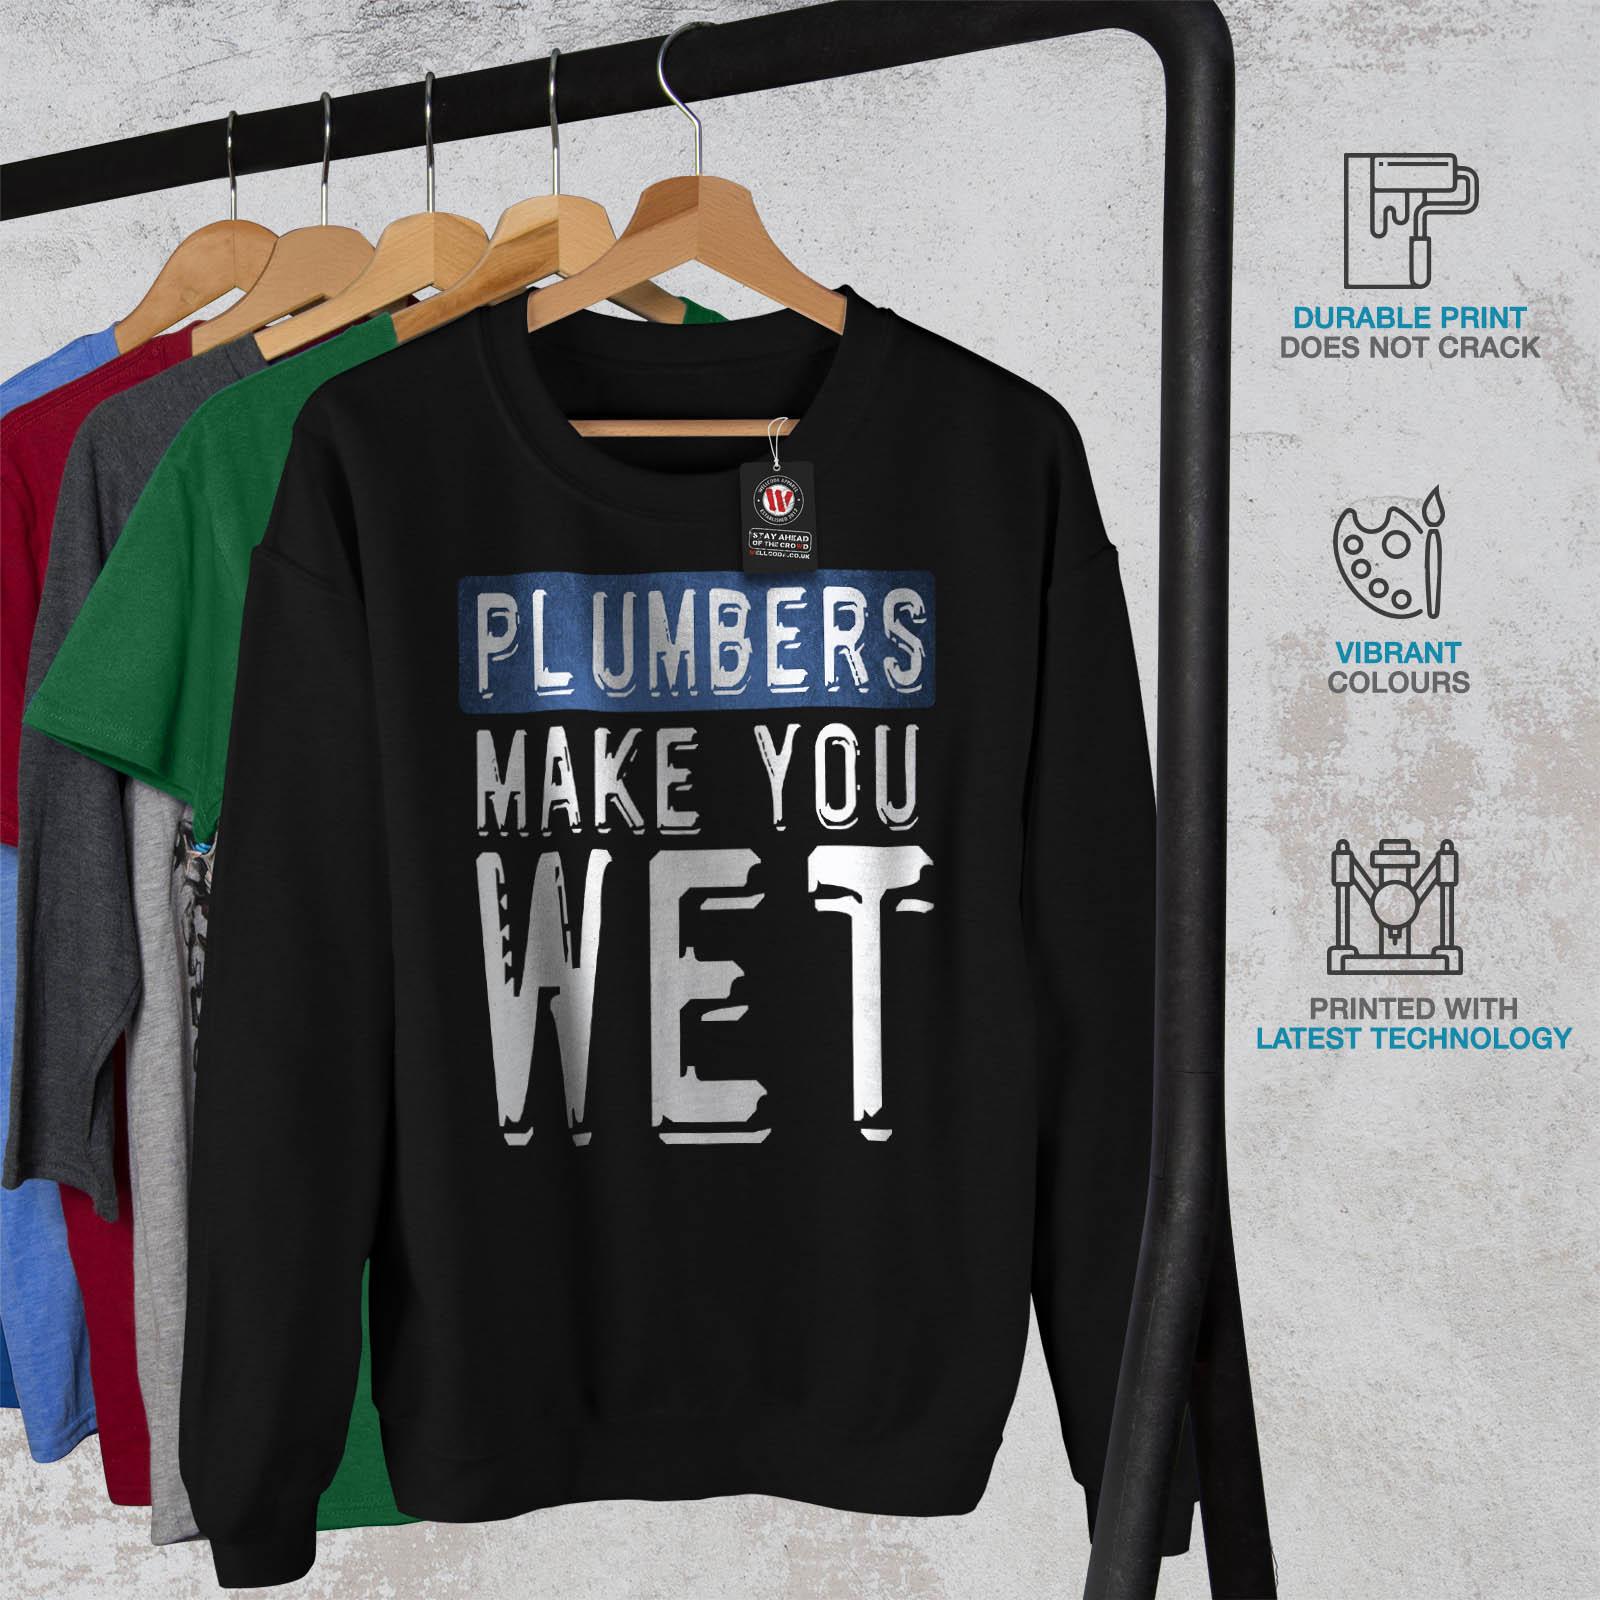 wellcoda Plumber Stop Mens Sweatshirt When Done Casual Jumper